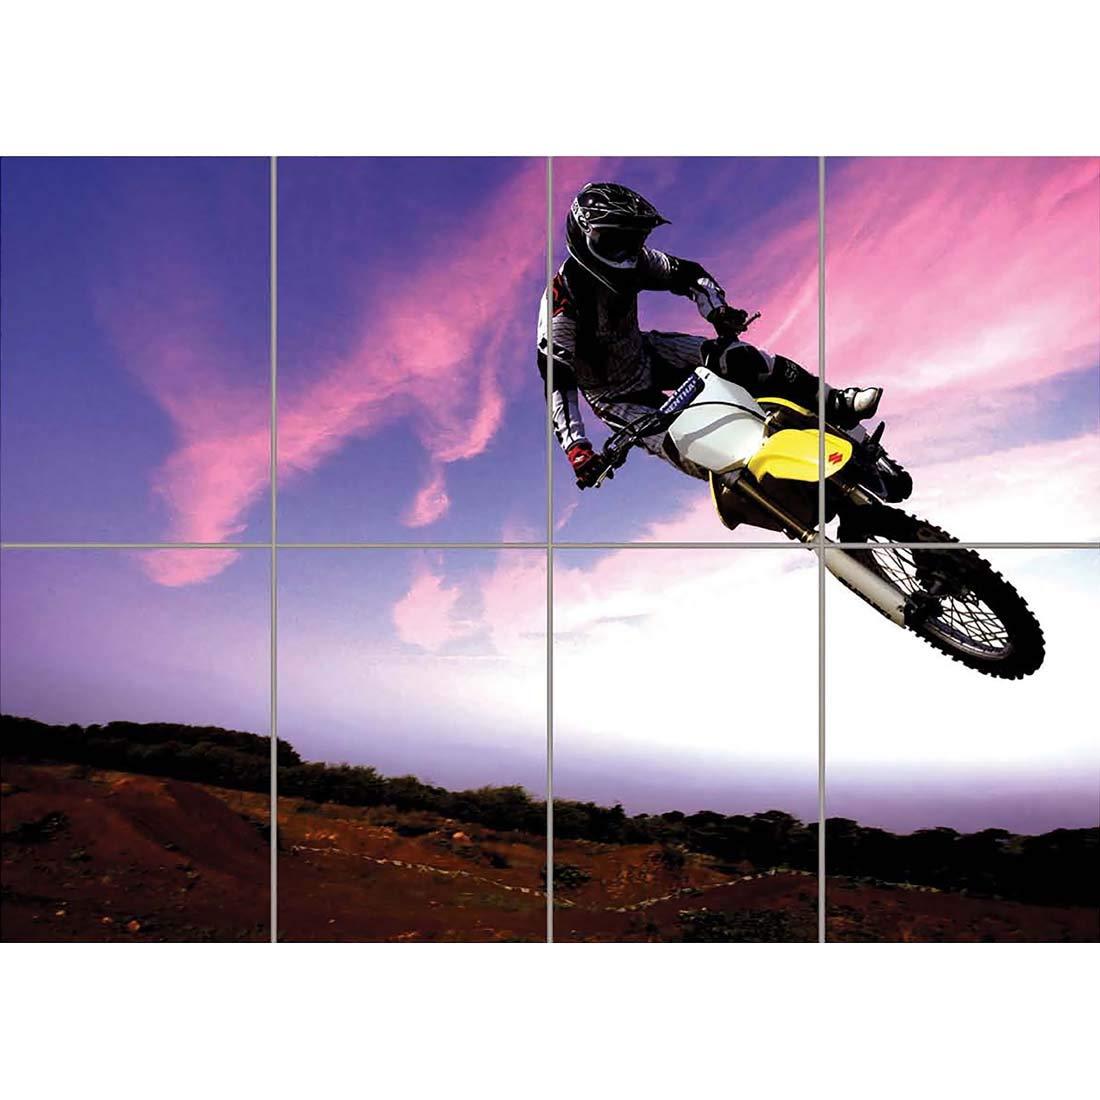 Amazon Motocross Dirt Bike Stunt Giant Poster Art Print X3205